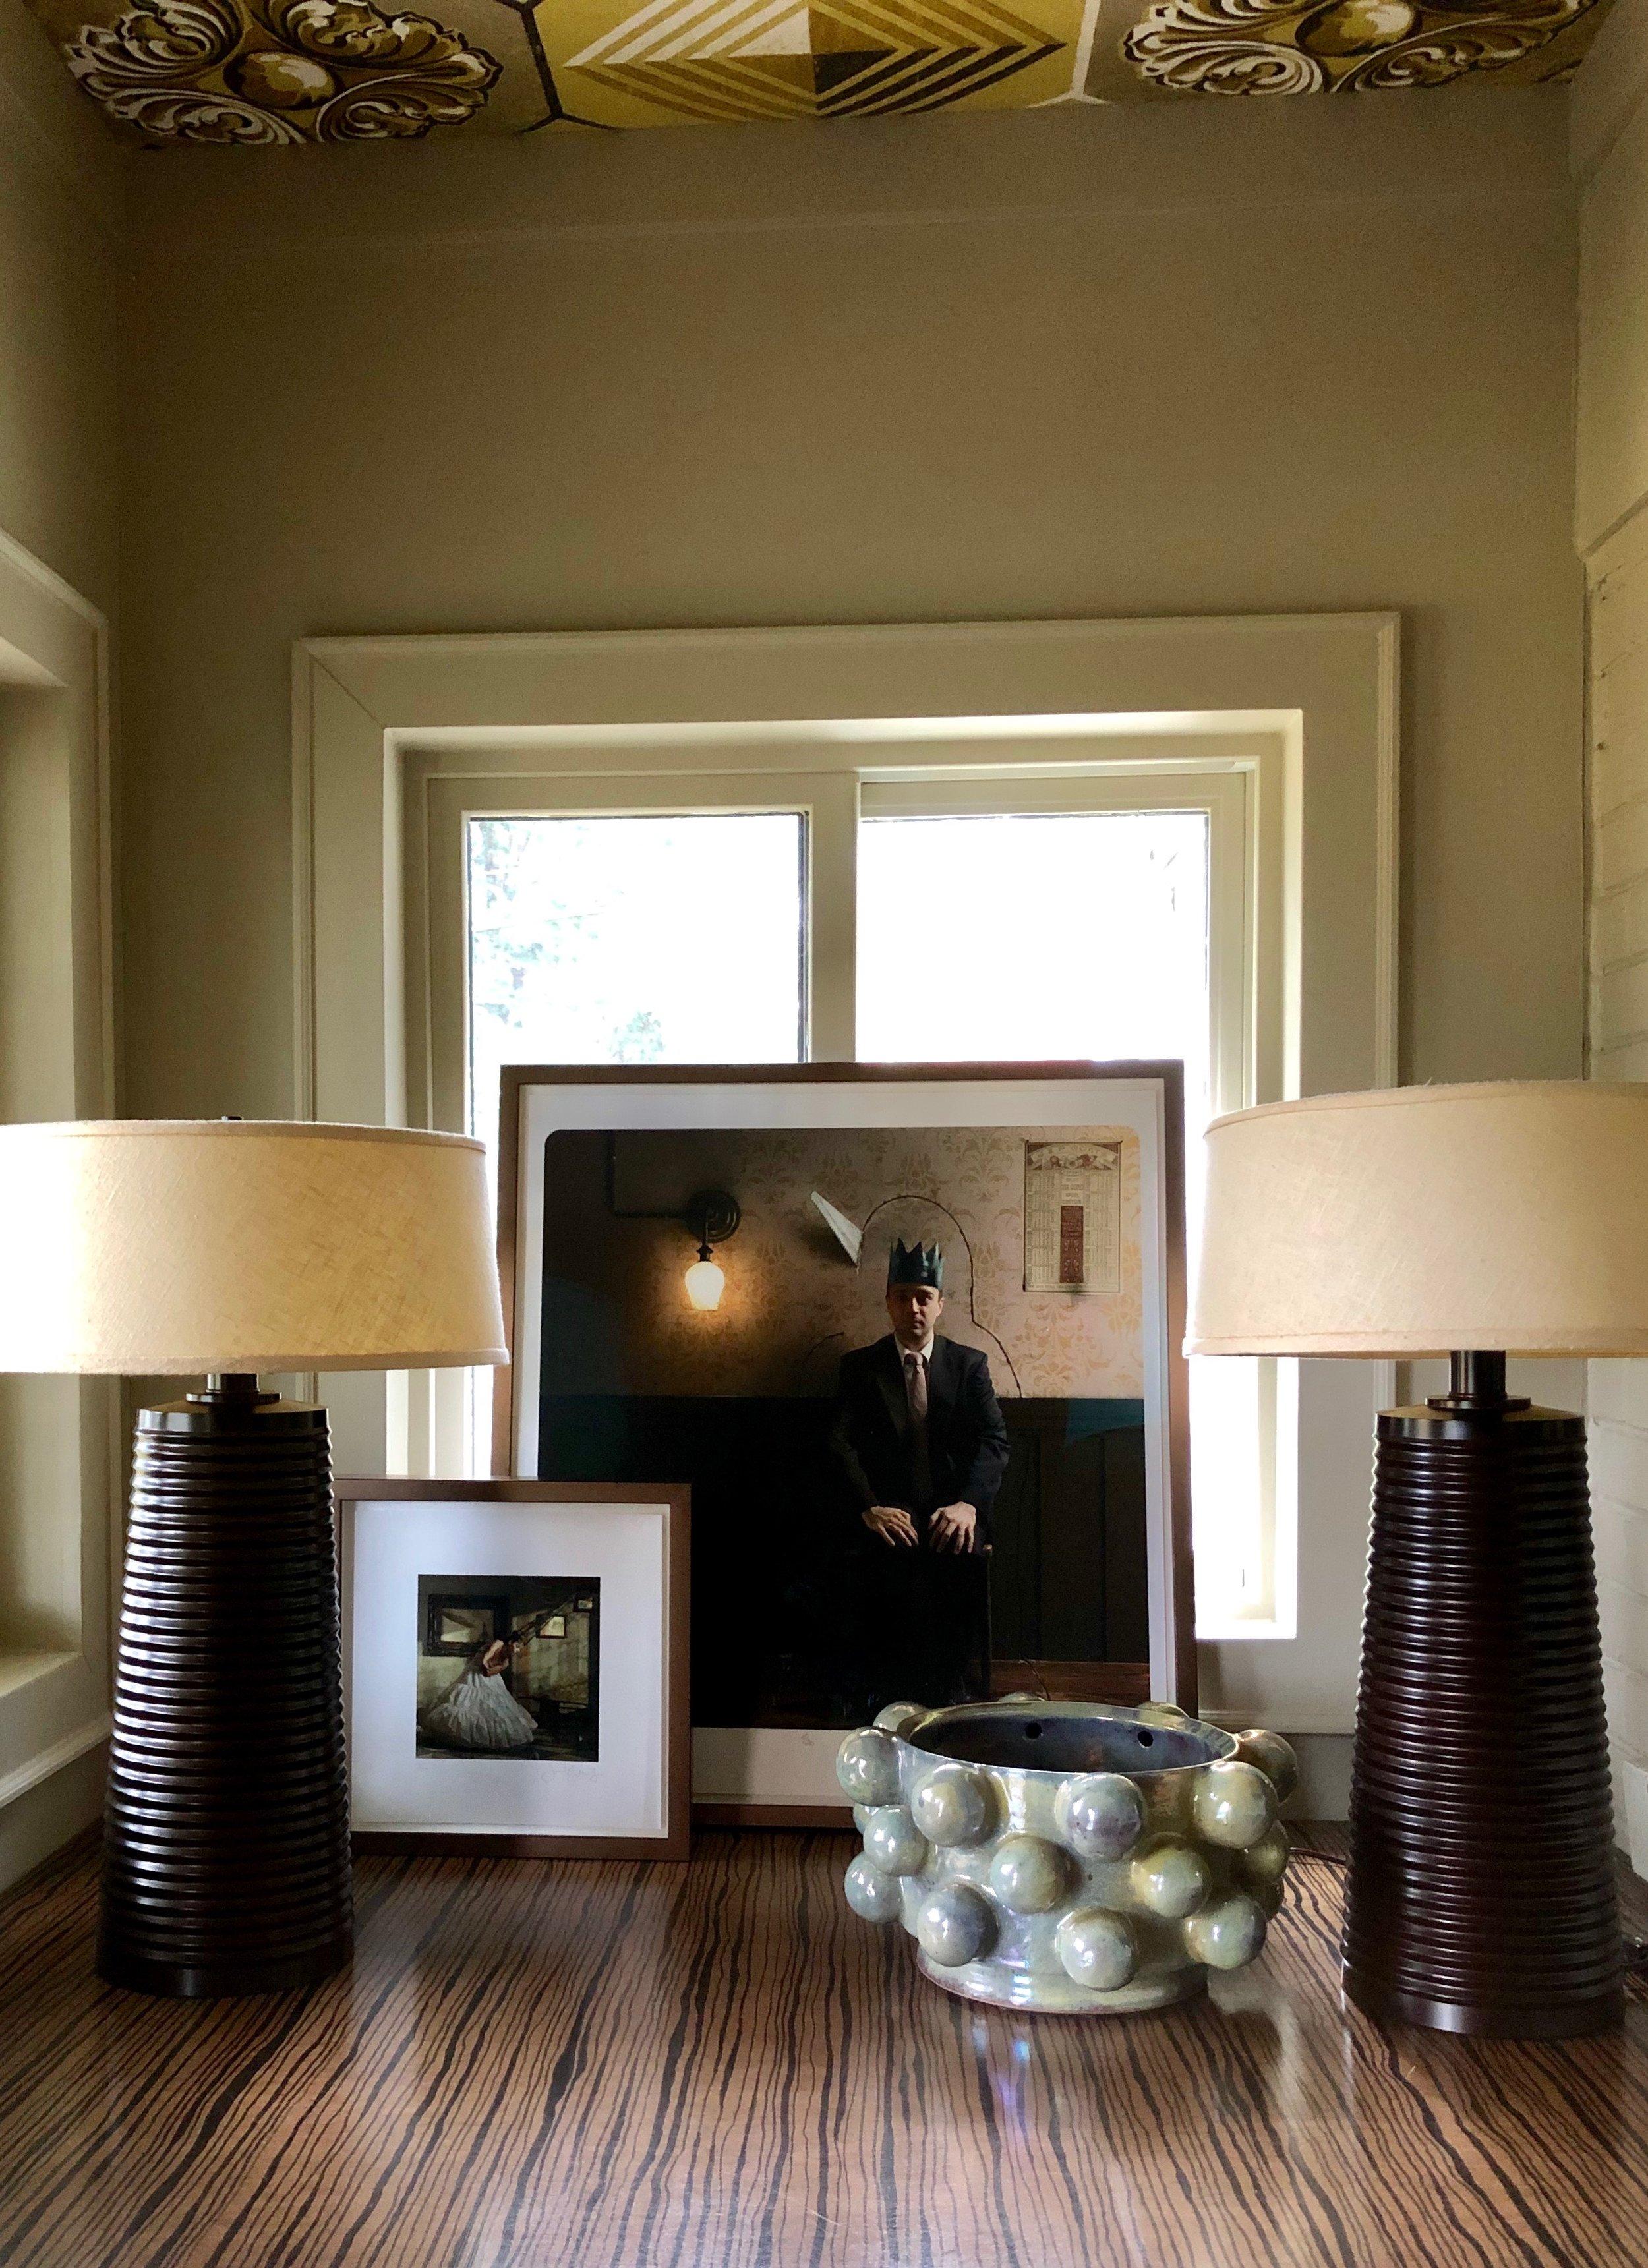 photographs by jamie baldridge + ceramic vase by virginia scotchie